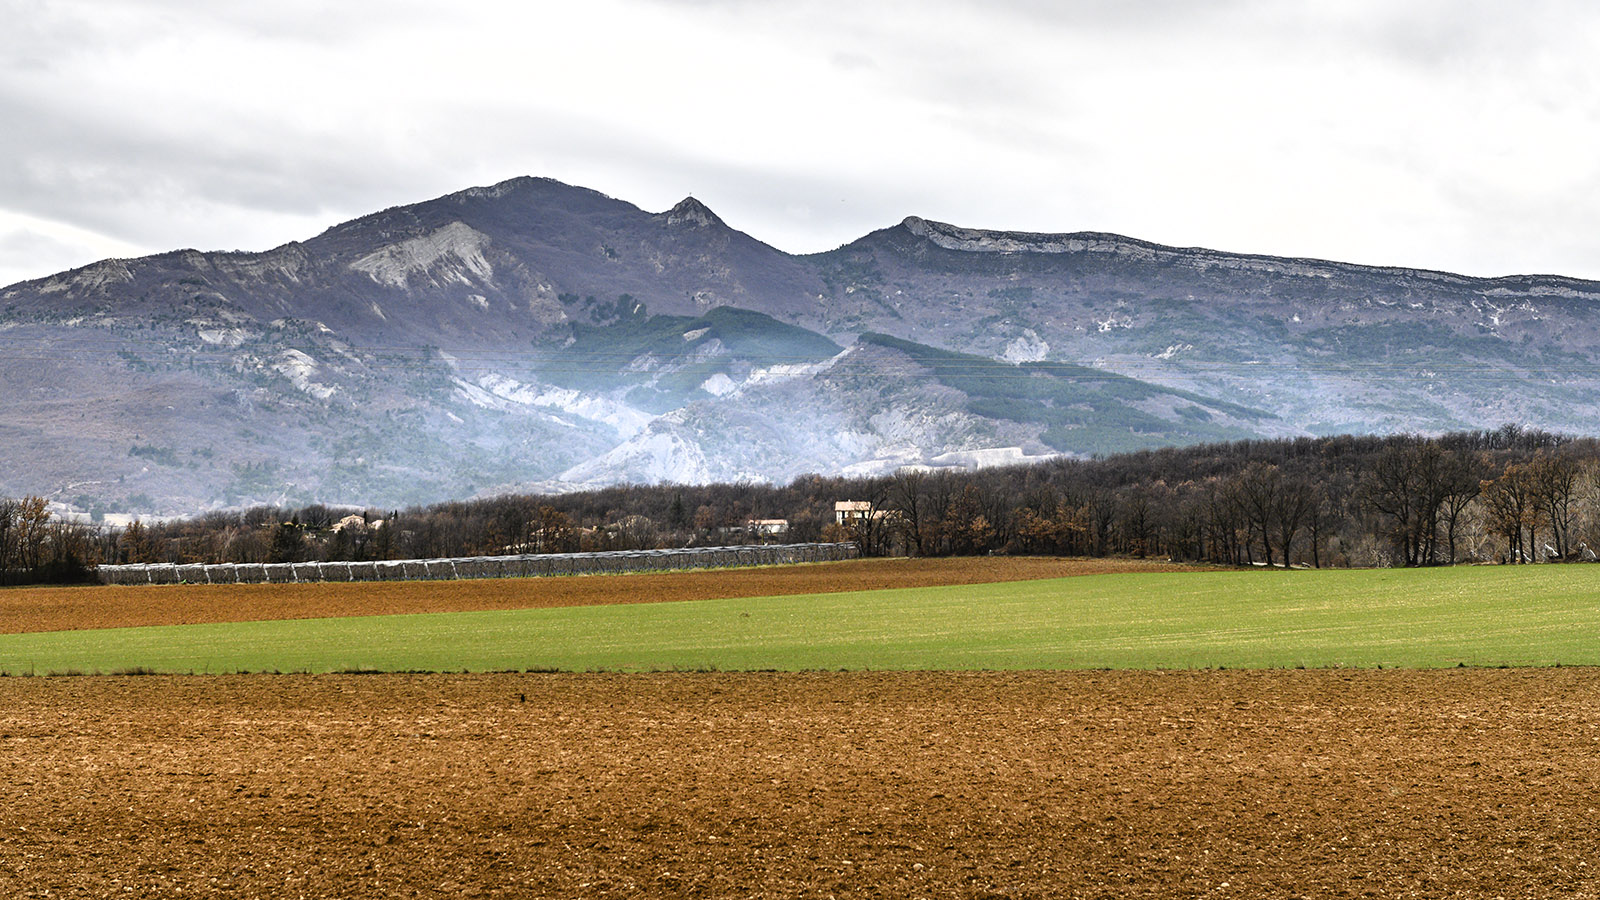 Der Geopark der Haute-Provence bei Digne-les-Bains. Foto: Hilke Maunder